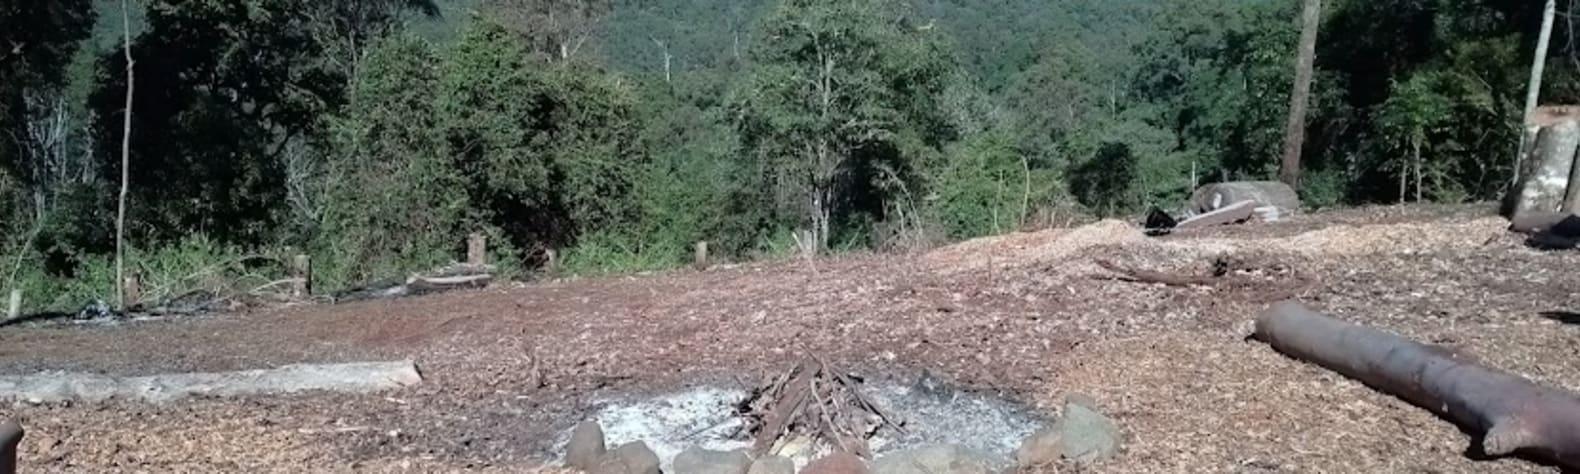 Murray Scrub Forest Views